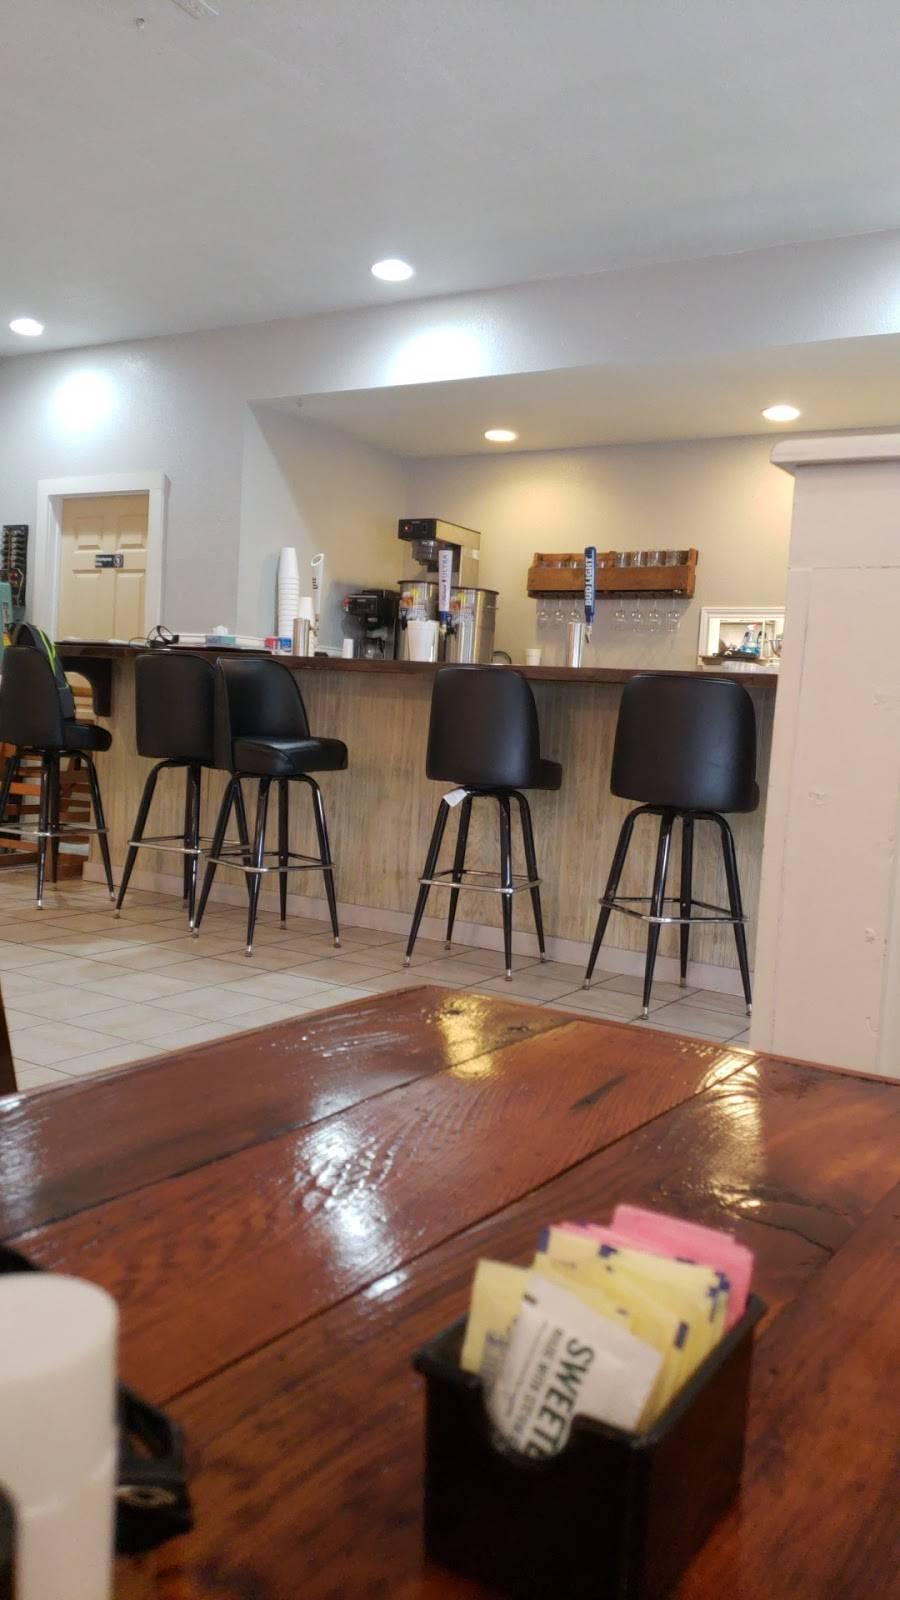 Main Street Bar and Grill   restaurant   520 W Main St, Ranger, TX 76470, USA   2546472005 OR +1 254-647-2005